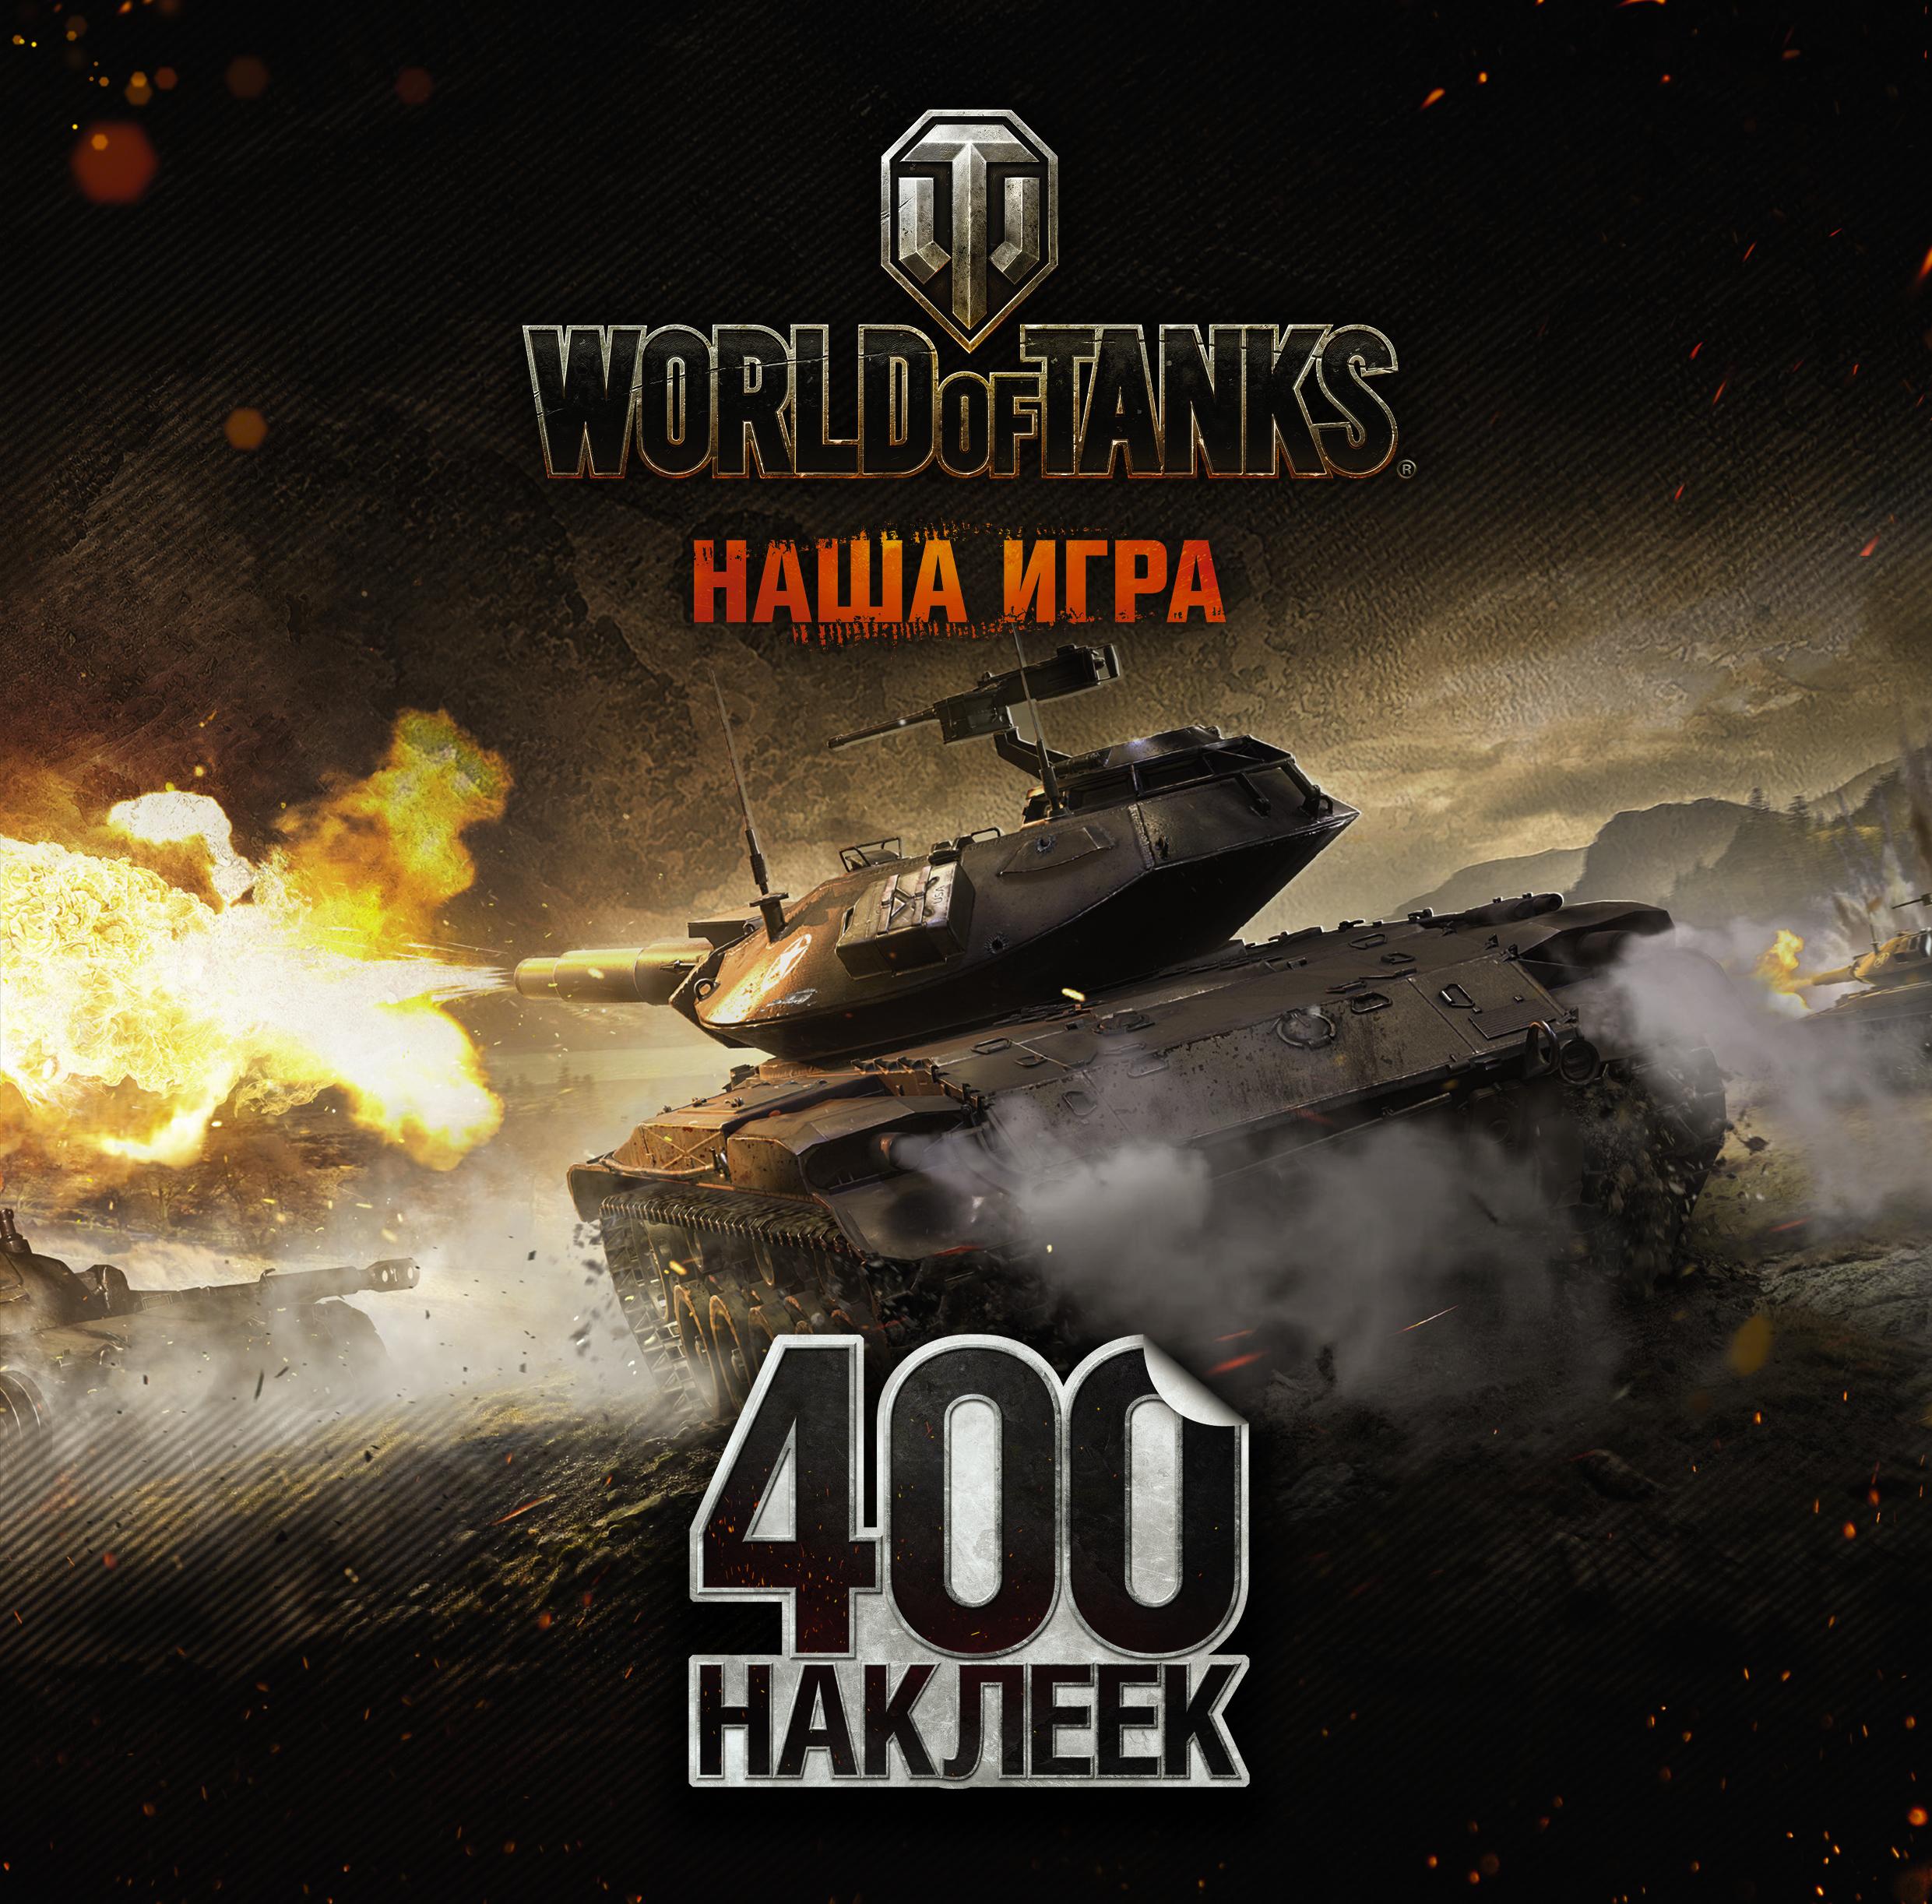 . World of Tanks. Альбом 400 наклеек (Т49) world of tanks альбом 400 наклеек 2